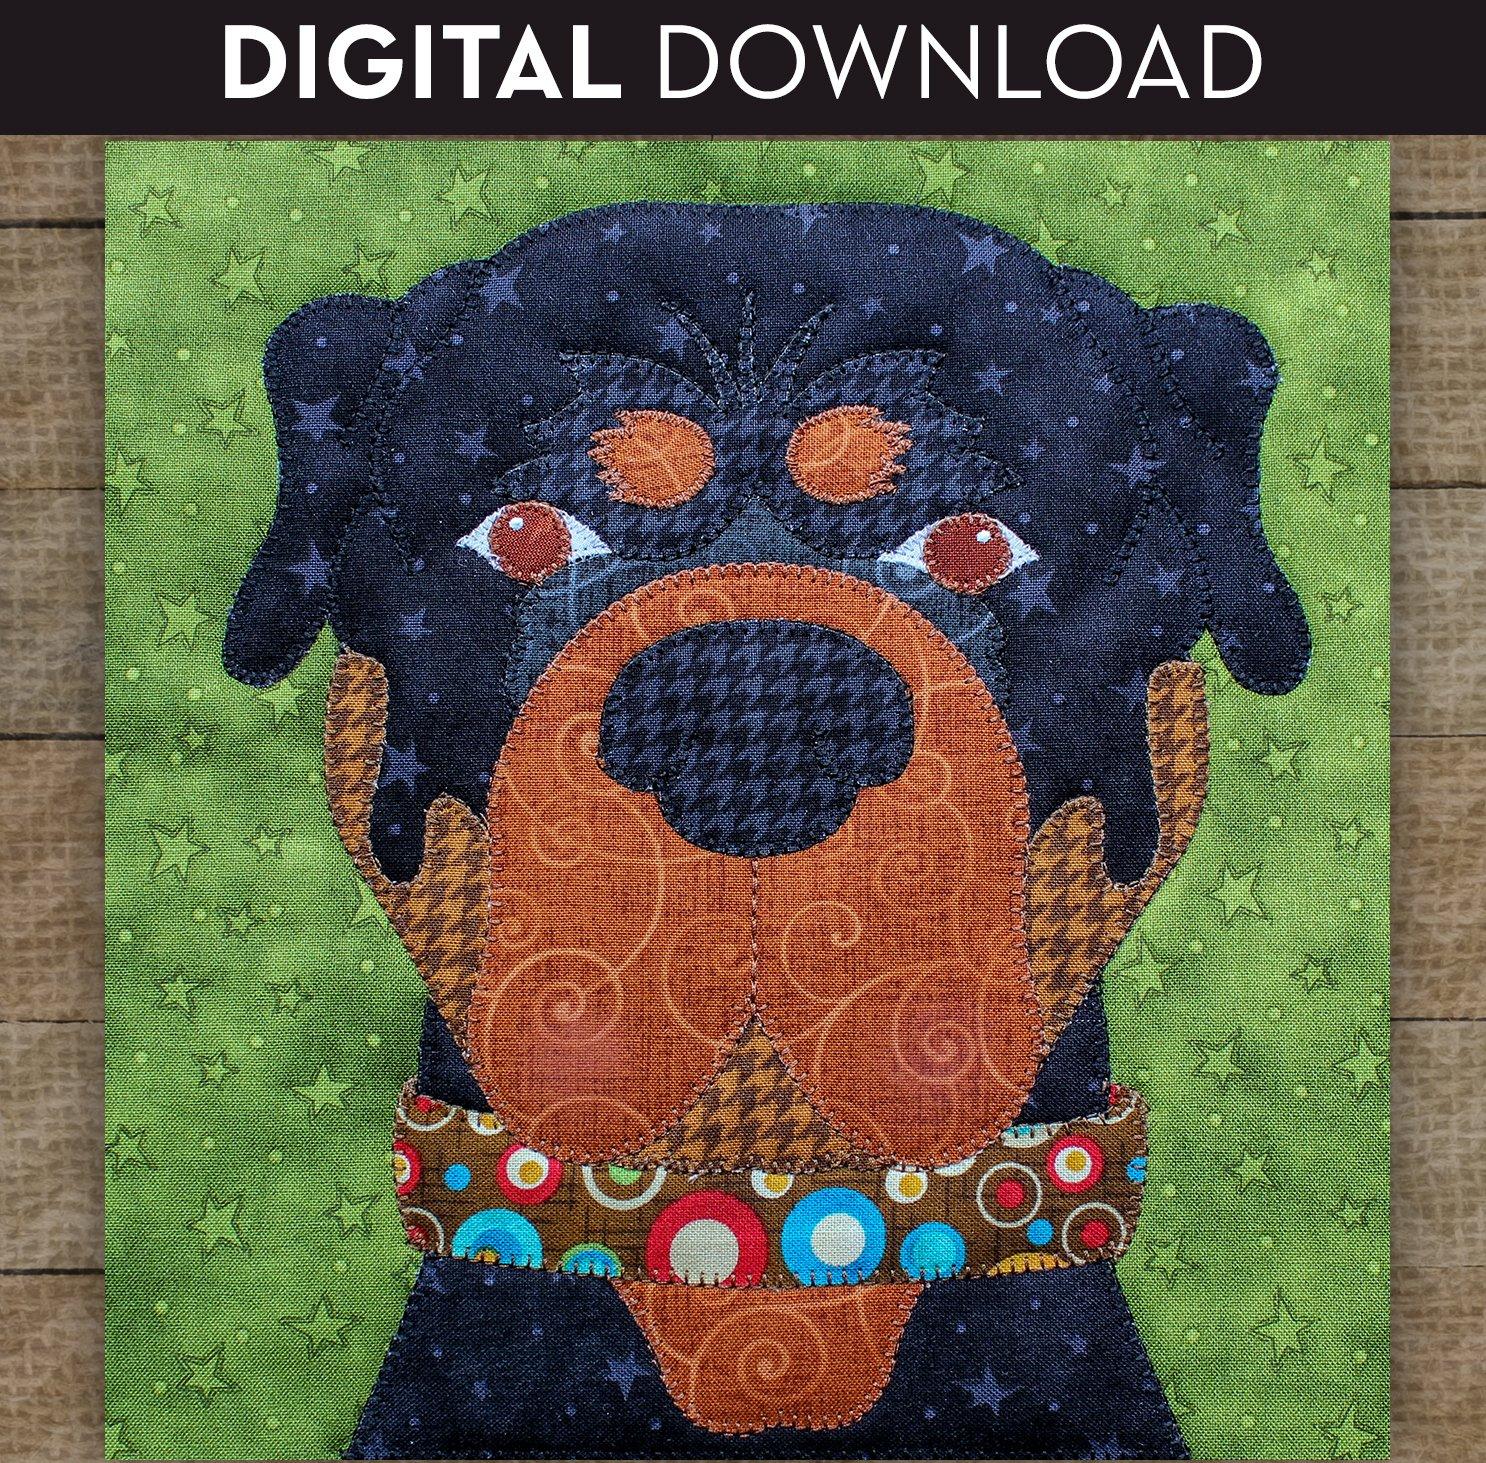 Rottweiler - Download